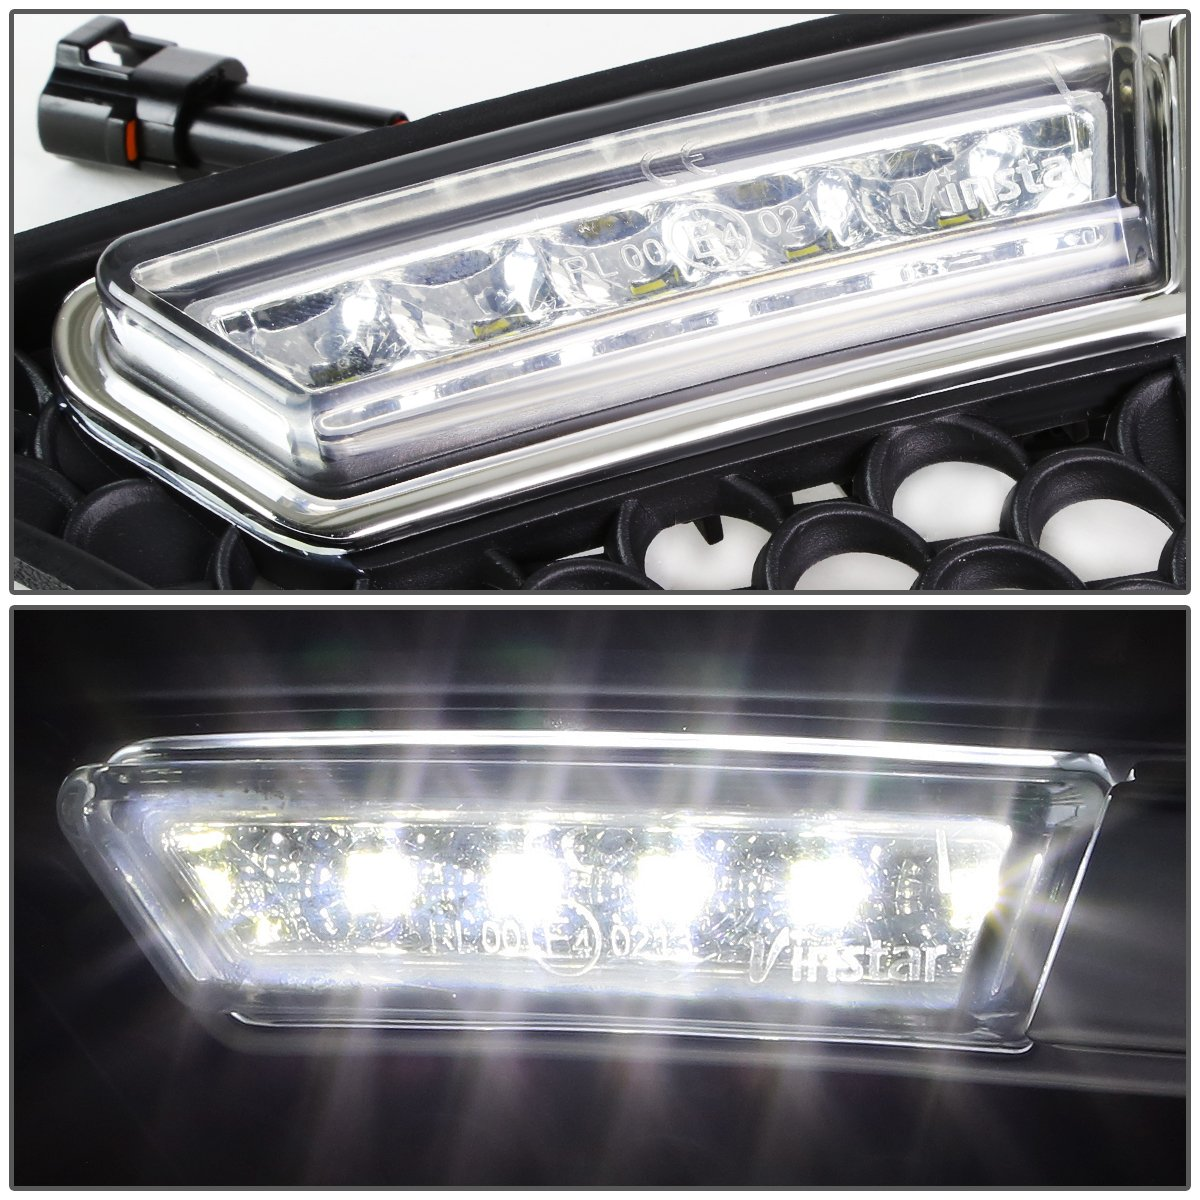 For Mercedes-Benz W204 C-Class Pair of Front Bumper Fog Light Bezel Integrated Day Time Running Lights